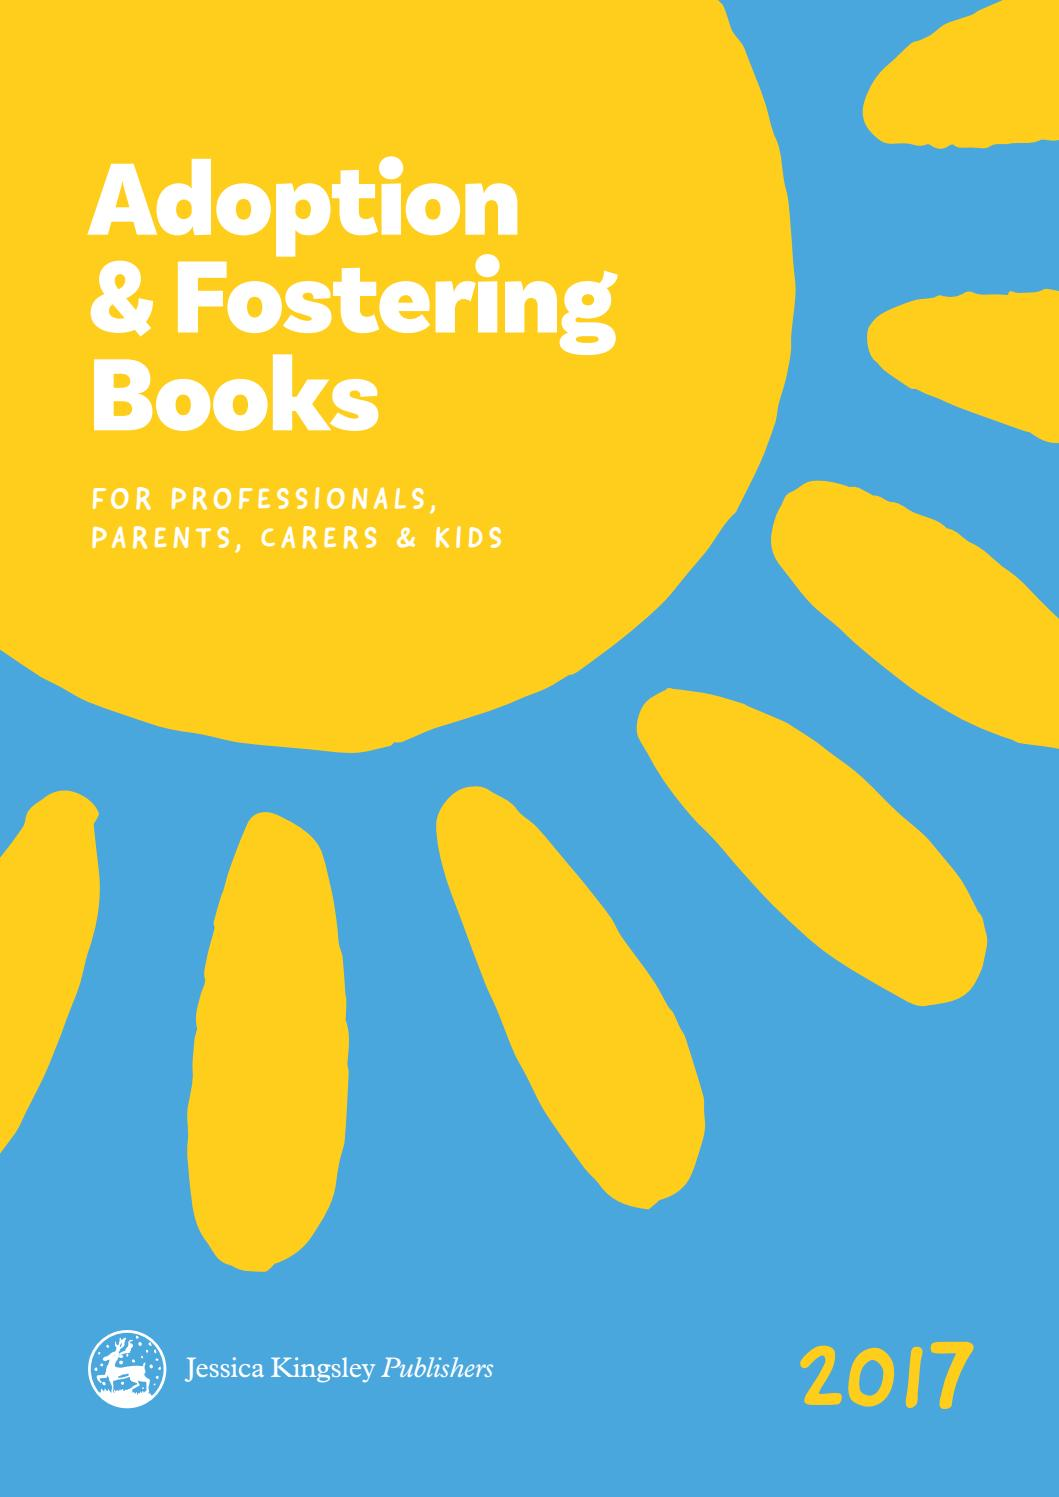 Jessica Kingsley Publishers - Adoption & Fostering catalogue 2017 by  Jessica Kingsley Publishers - issuu